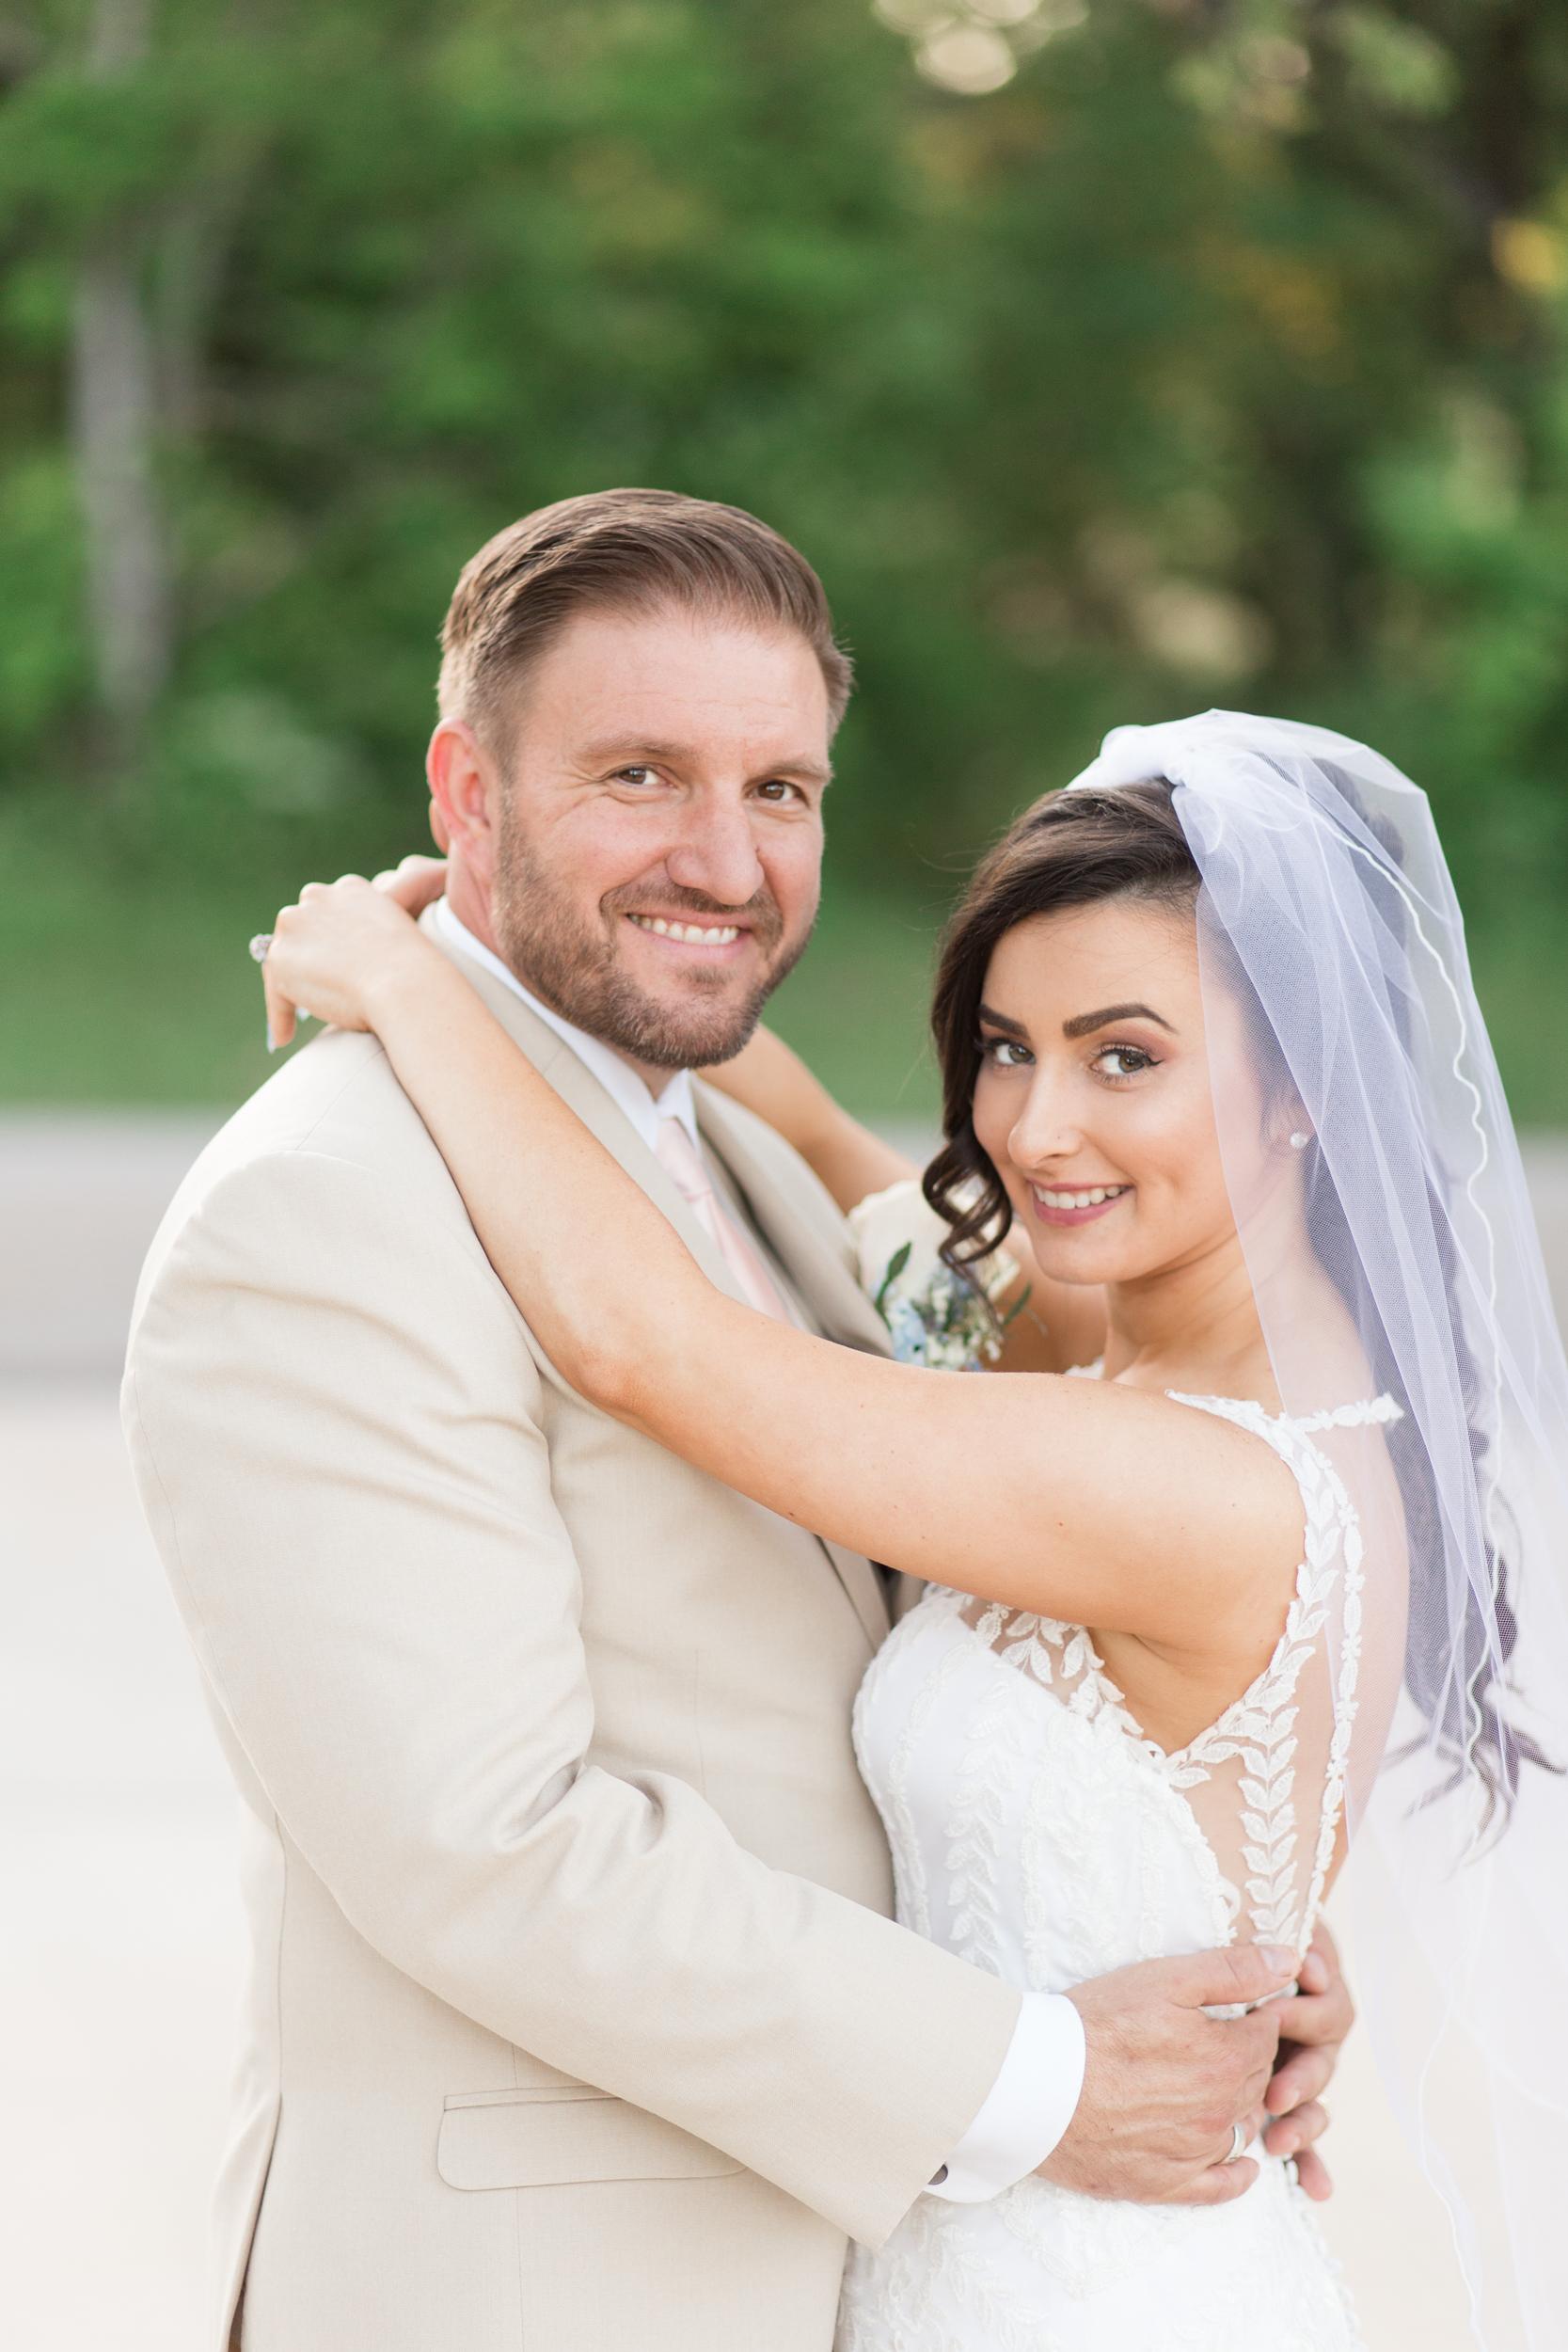 Zihlman-East TX Wedding_Kelsie Hendricks Photography_The Folmar Tyler Texas-125.jpg